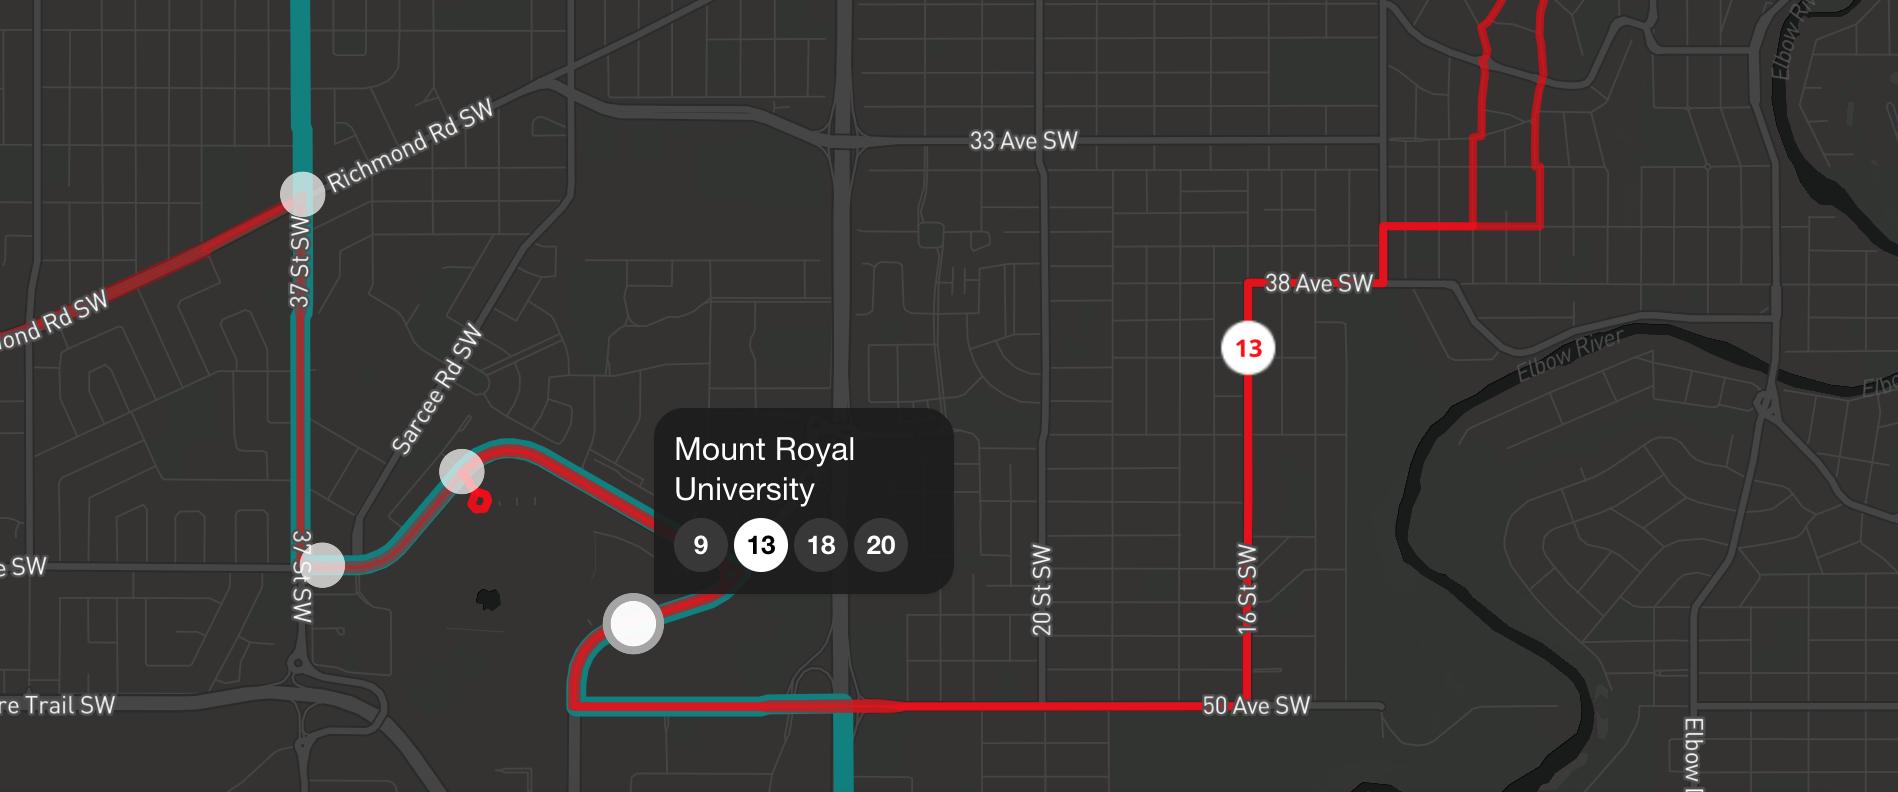 Designing a Transit Map: User Experience Design | Saadiq Mohiuddin